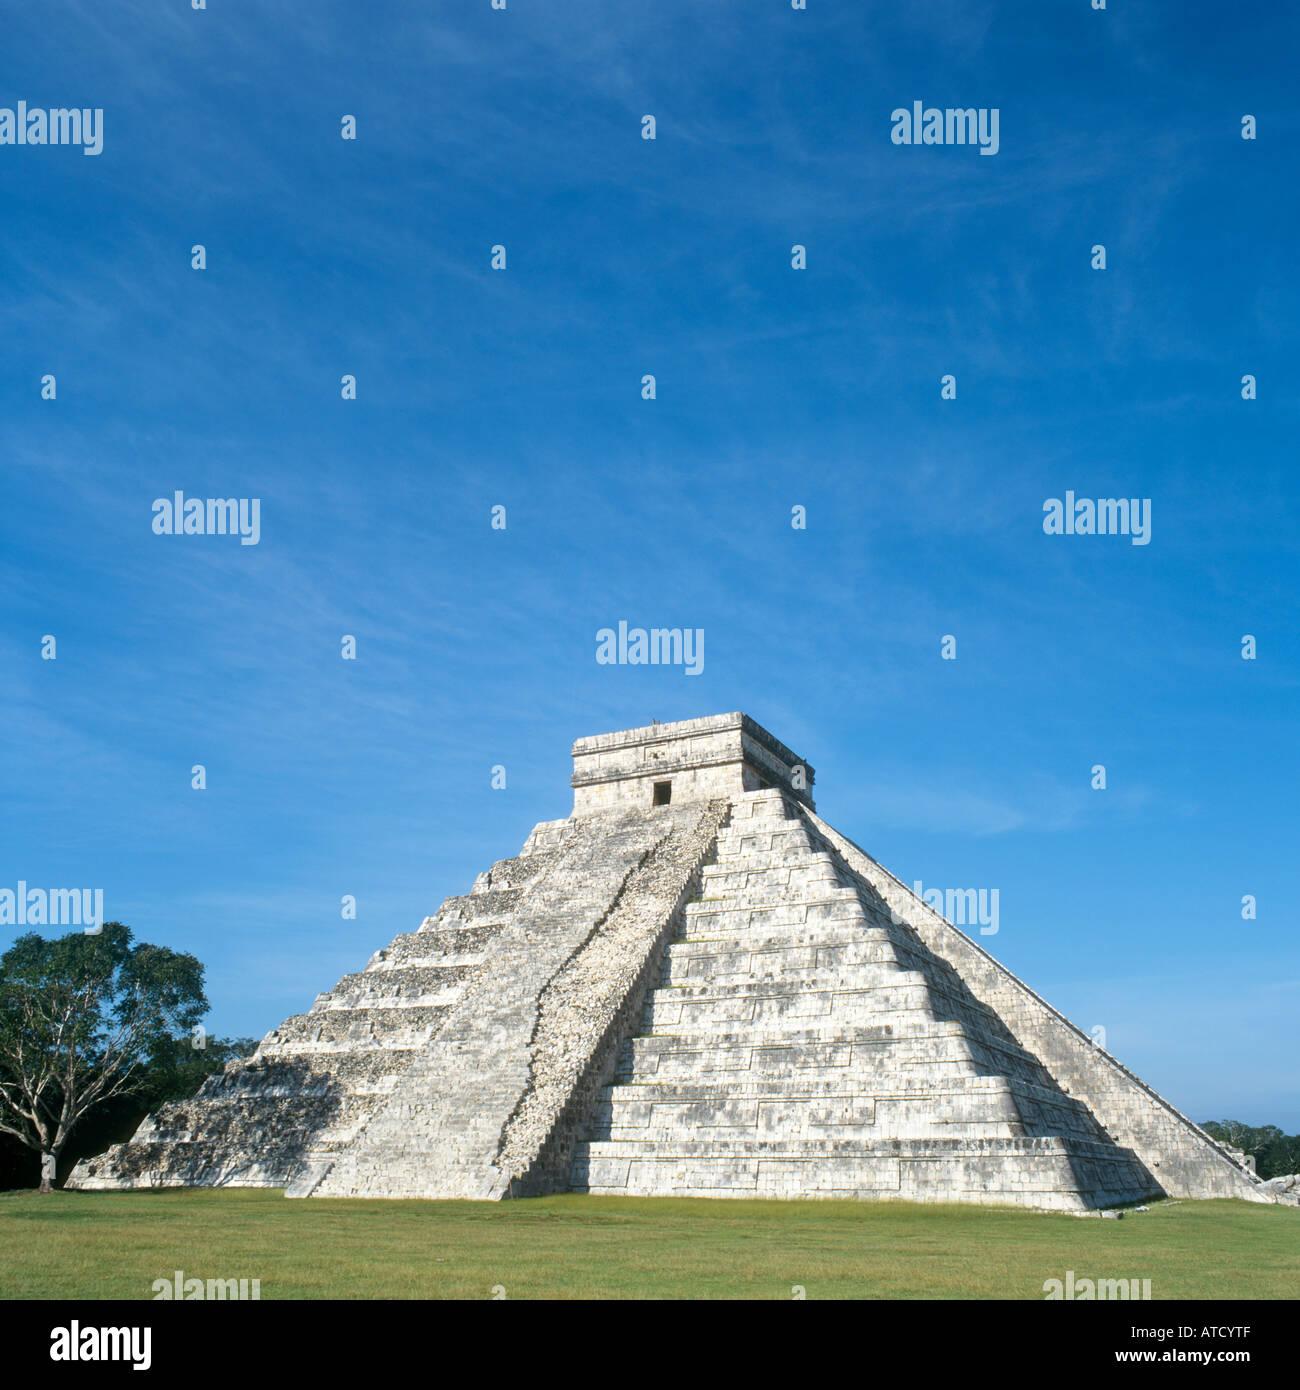 El Castillo or Pyramid of Kukulcan, Mayan Ruins of Chichen Itza, Yucatan Peninsula, Mexico - Stock Image